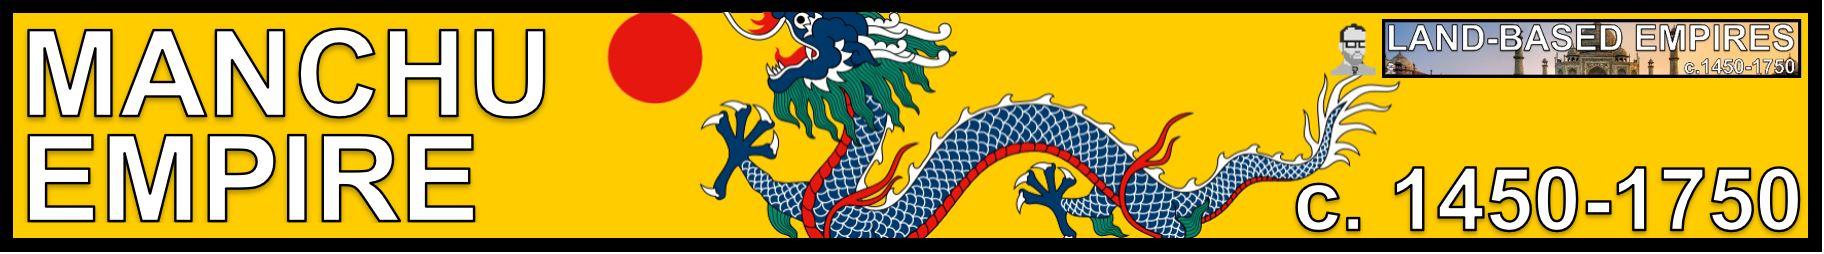 MANCHU BANNER LAND BASED EMPIRES AP WORLD HISTORY FREEMANPEDIA.JPG